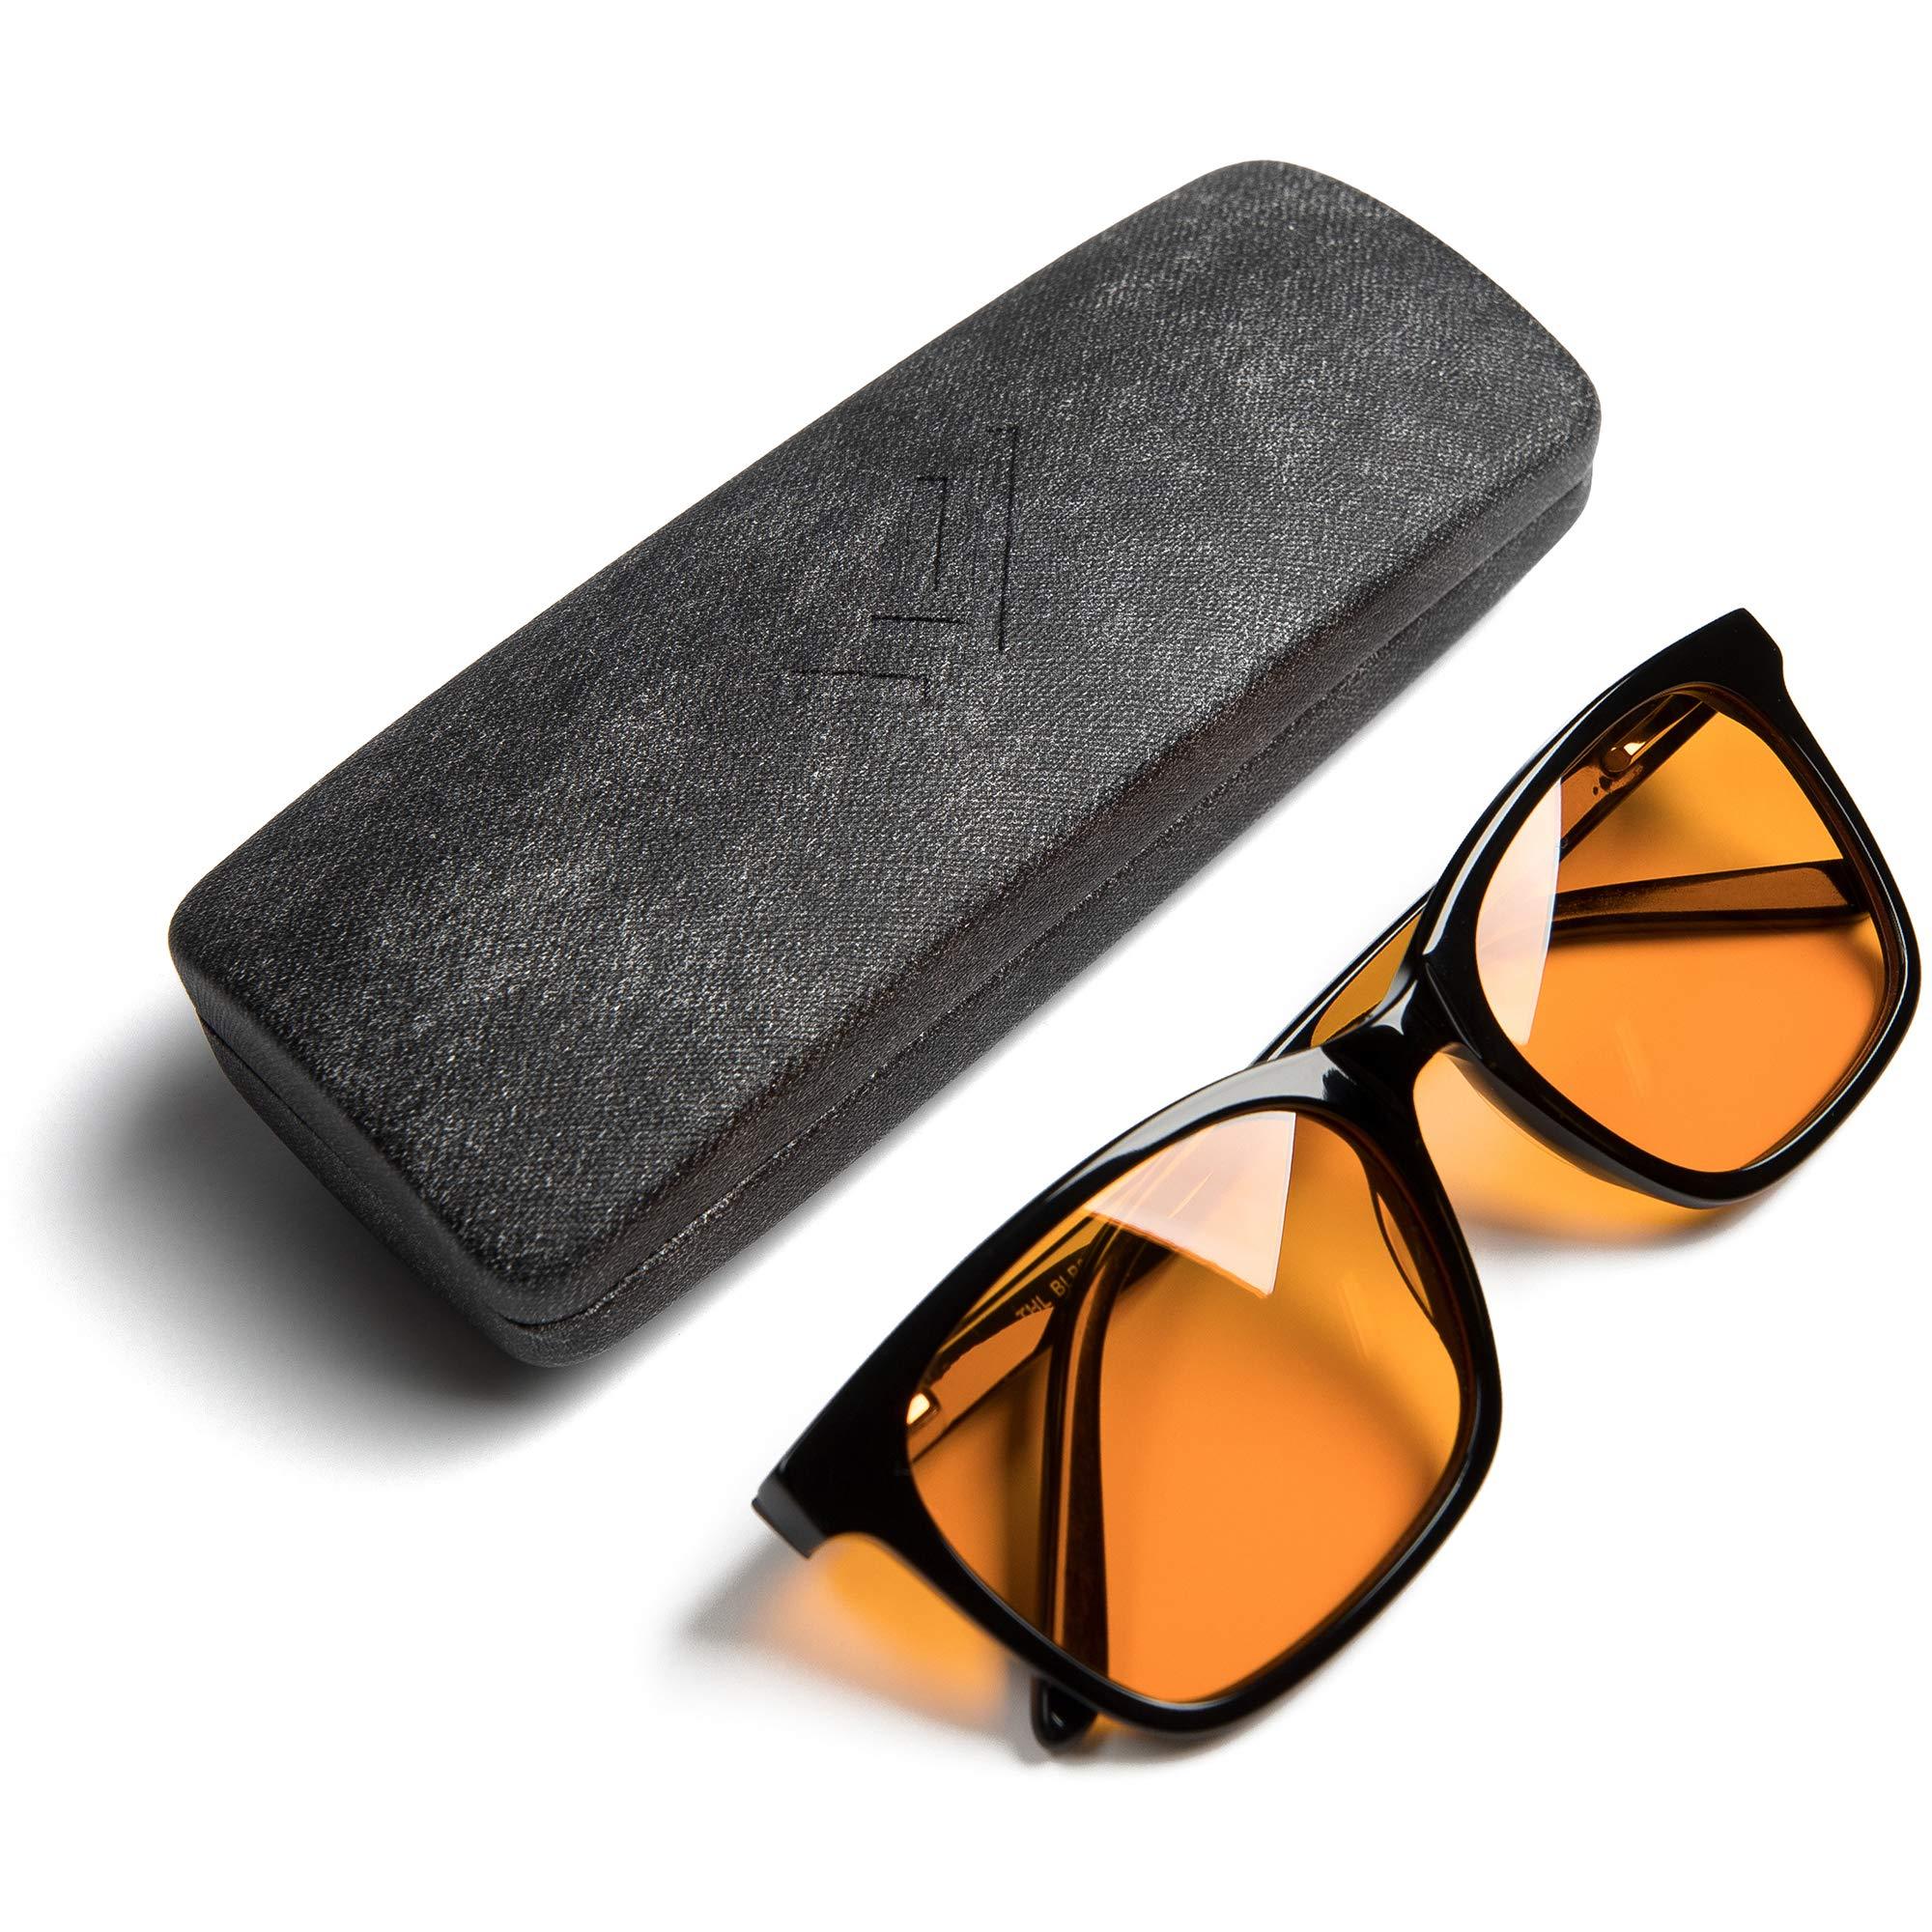 Blue Light Blocking Glasses - Large - Computer and Gaming Eyeglasses for Better Night Sleep - Filter Artificial Blue Screen Light - Anti Eye Strain - Orange Amber Lenses - by THL Sleep